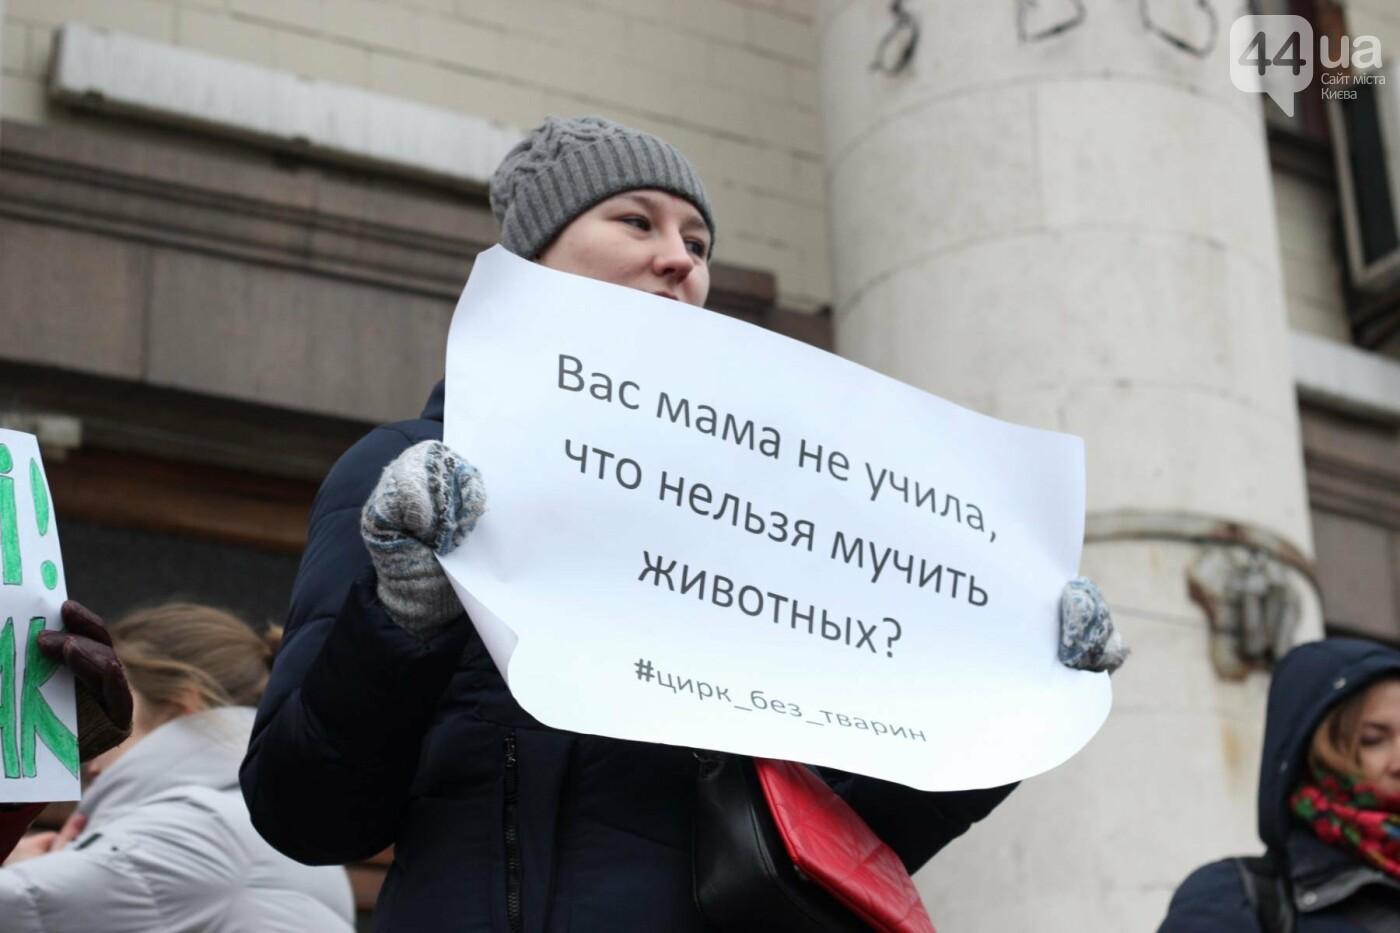 Цирк без животных: как в Киеве прошла акция протеста, фото-8